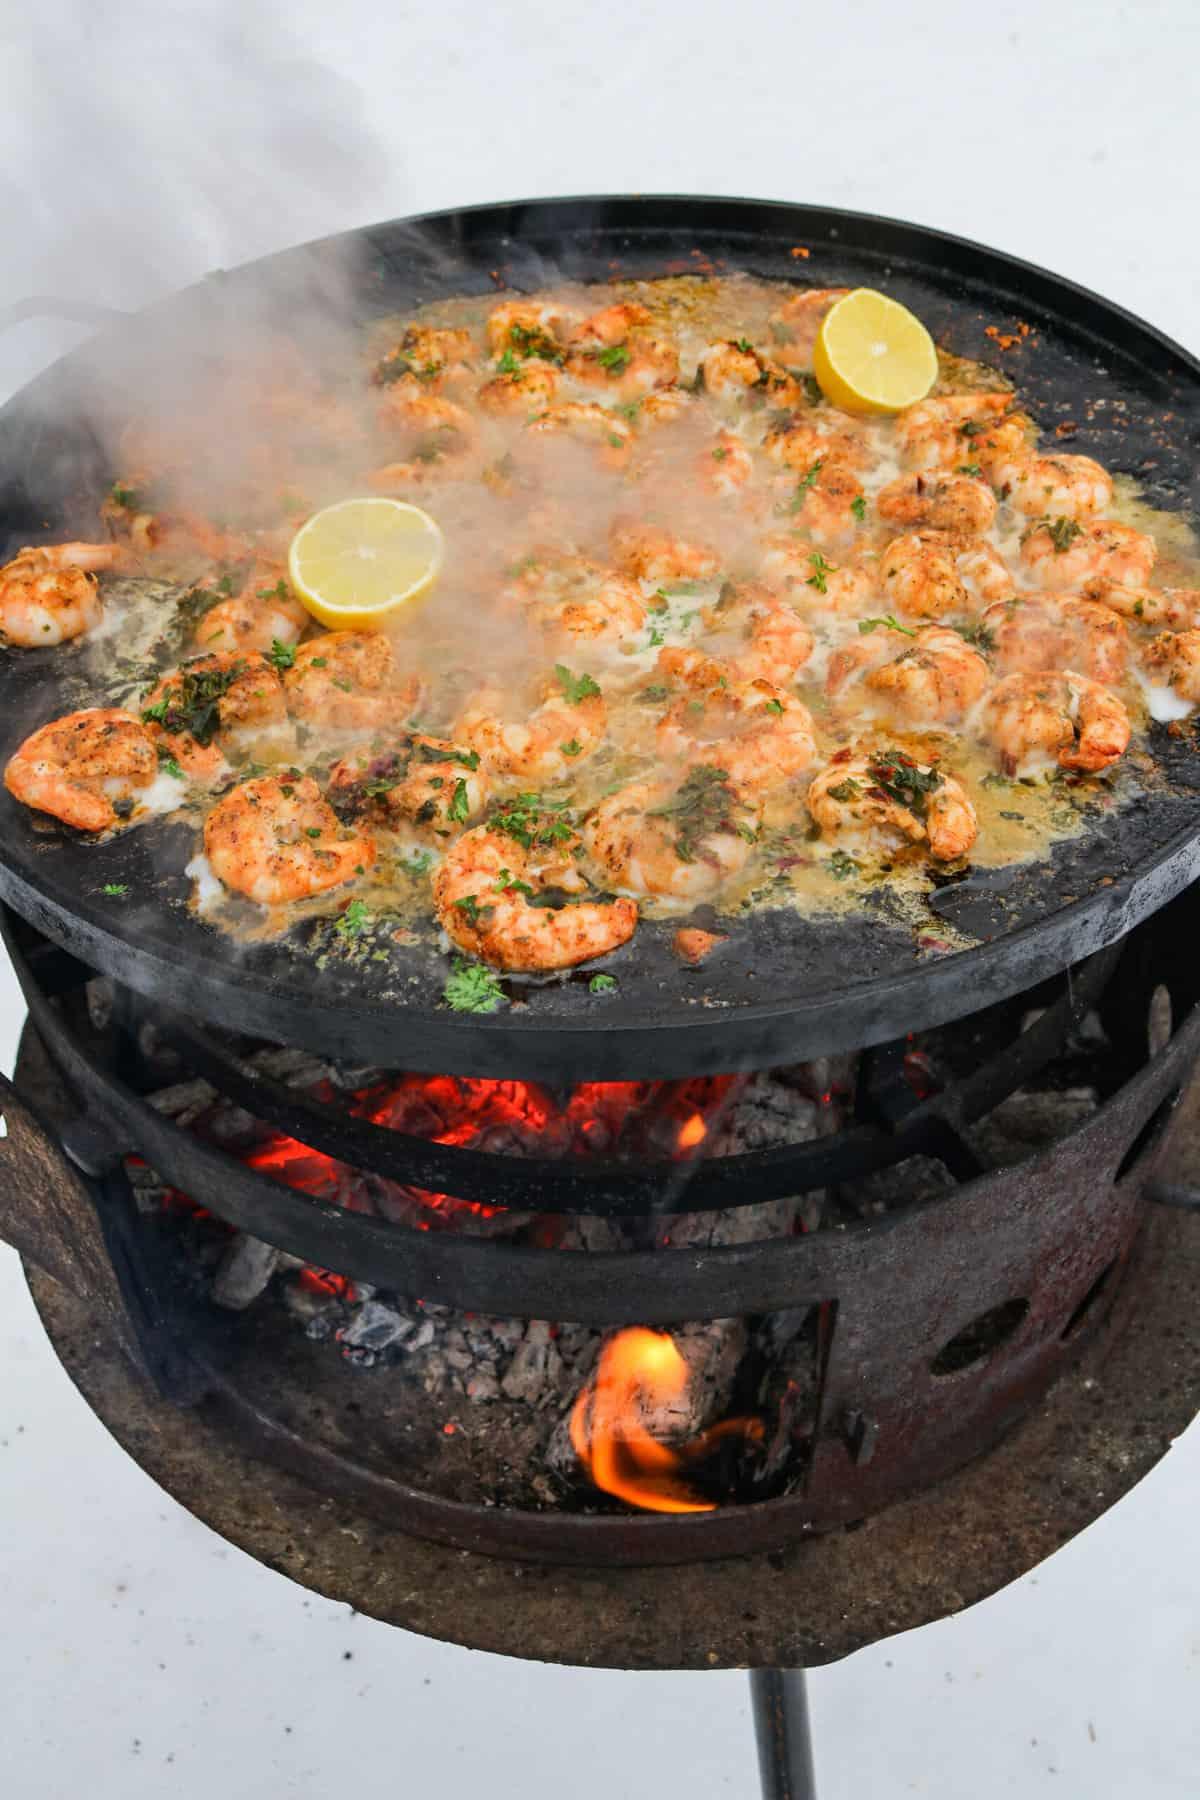 Chipotle Garlic butter Shrimp